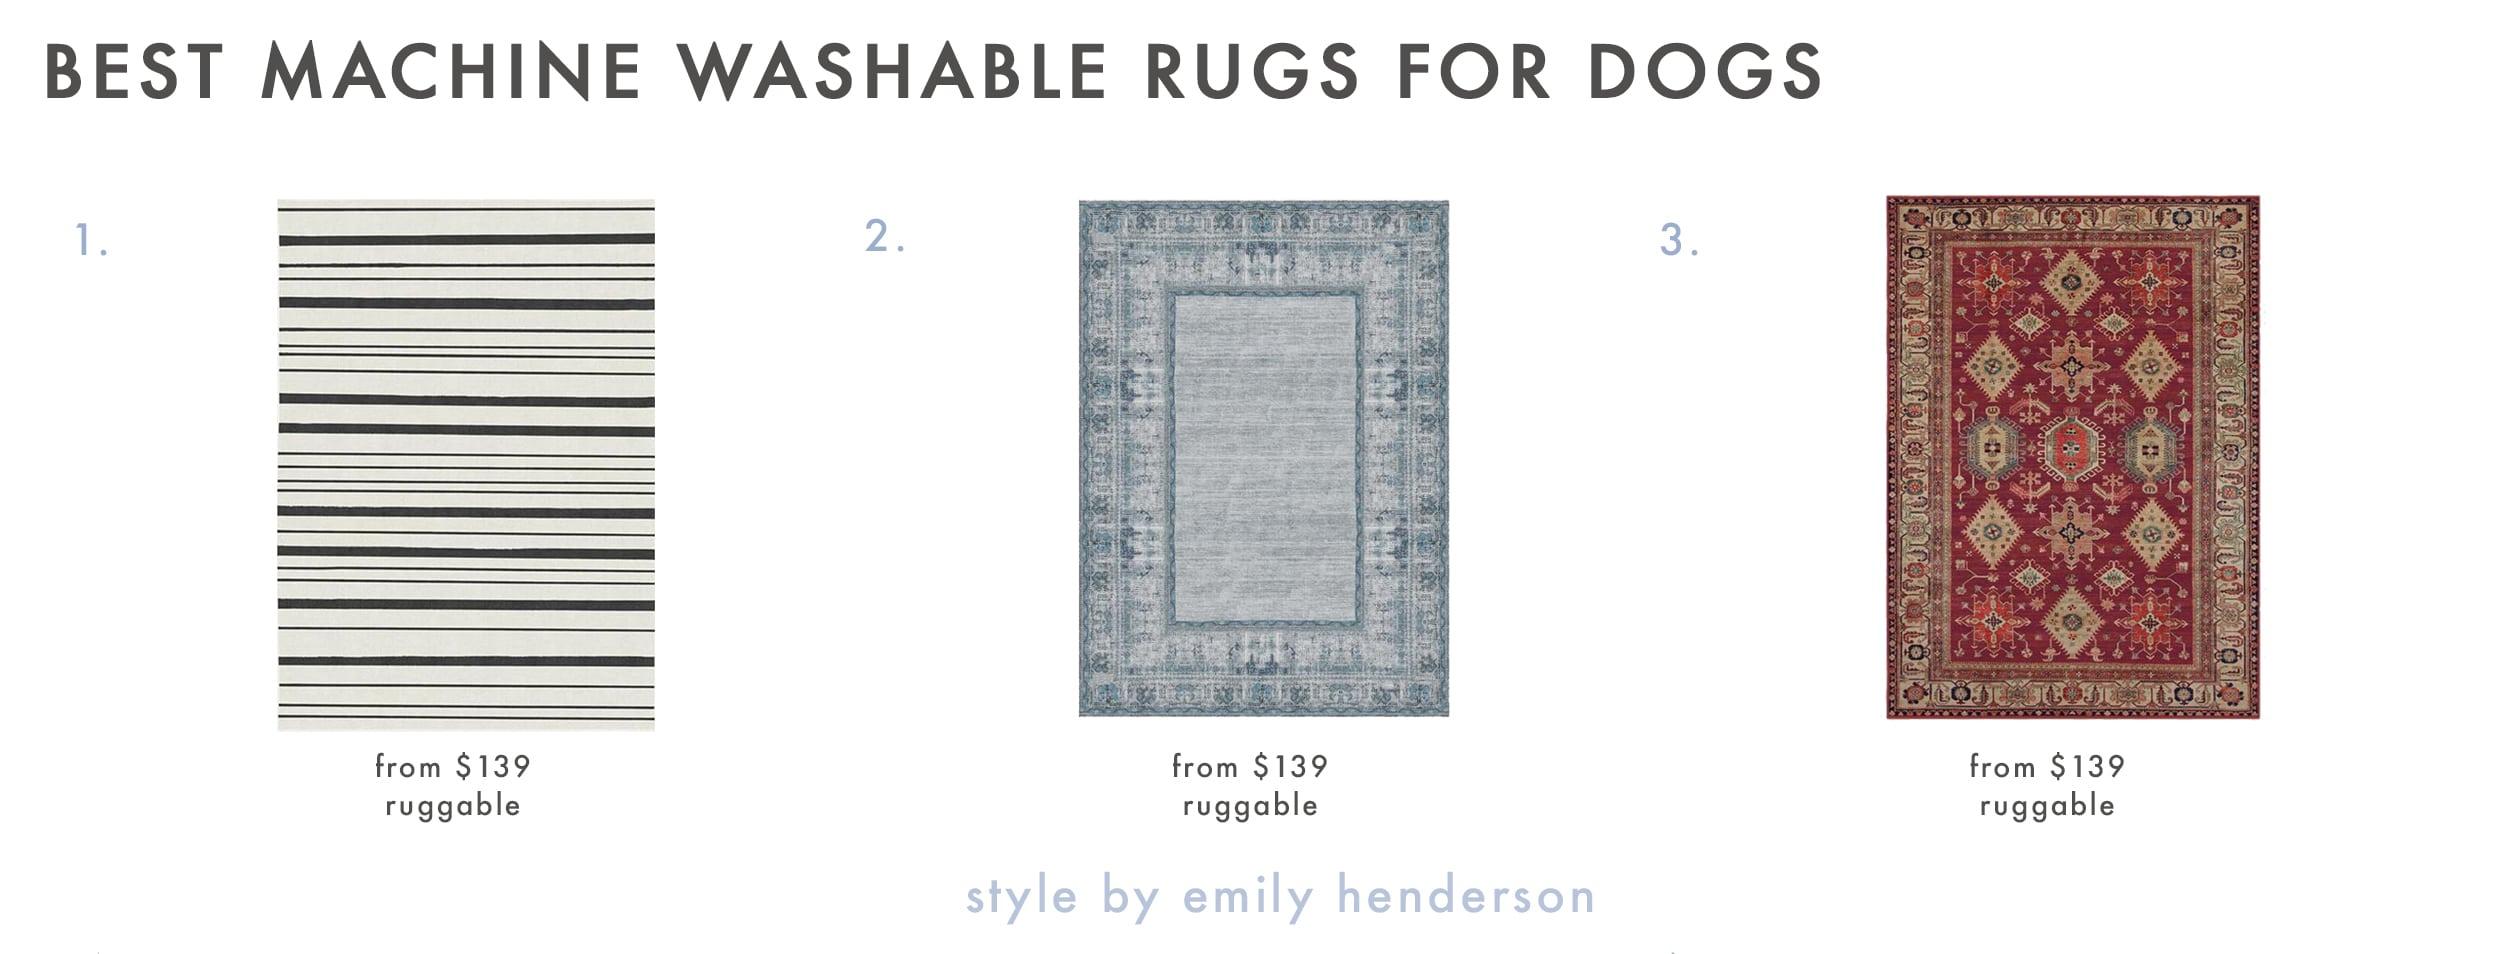 Dog Friendly Ruggable Copy